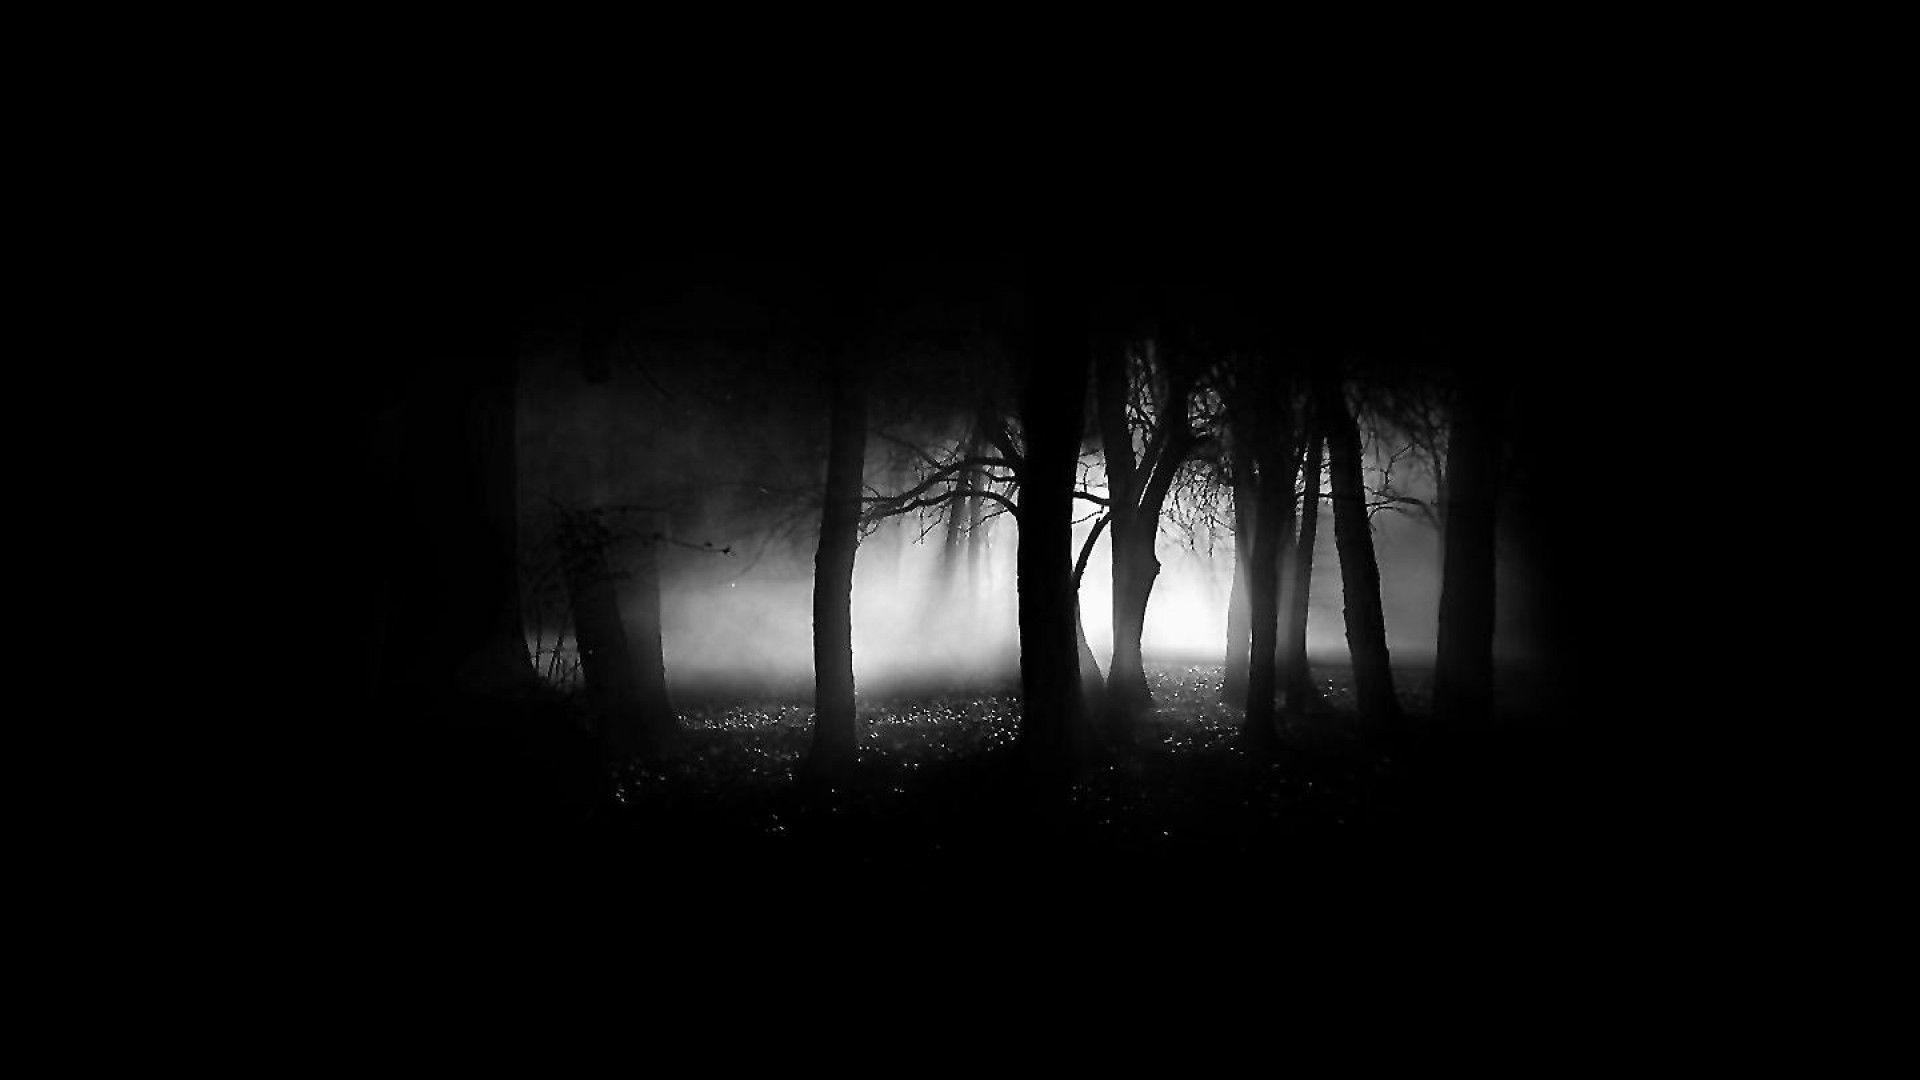 Breathtaking Dark Wallpapers For Your Desktop Hongkiat